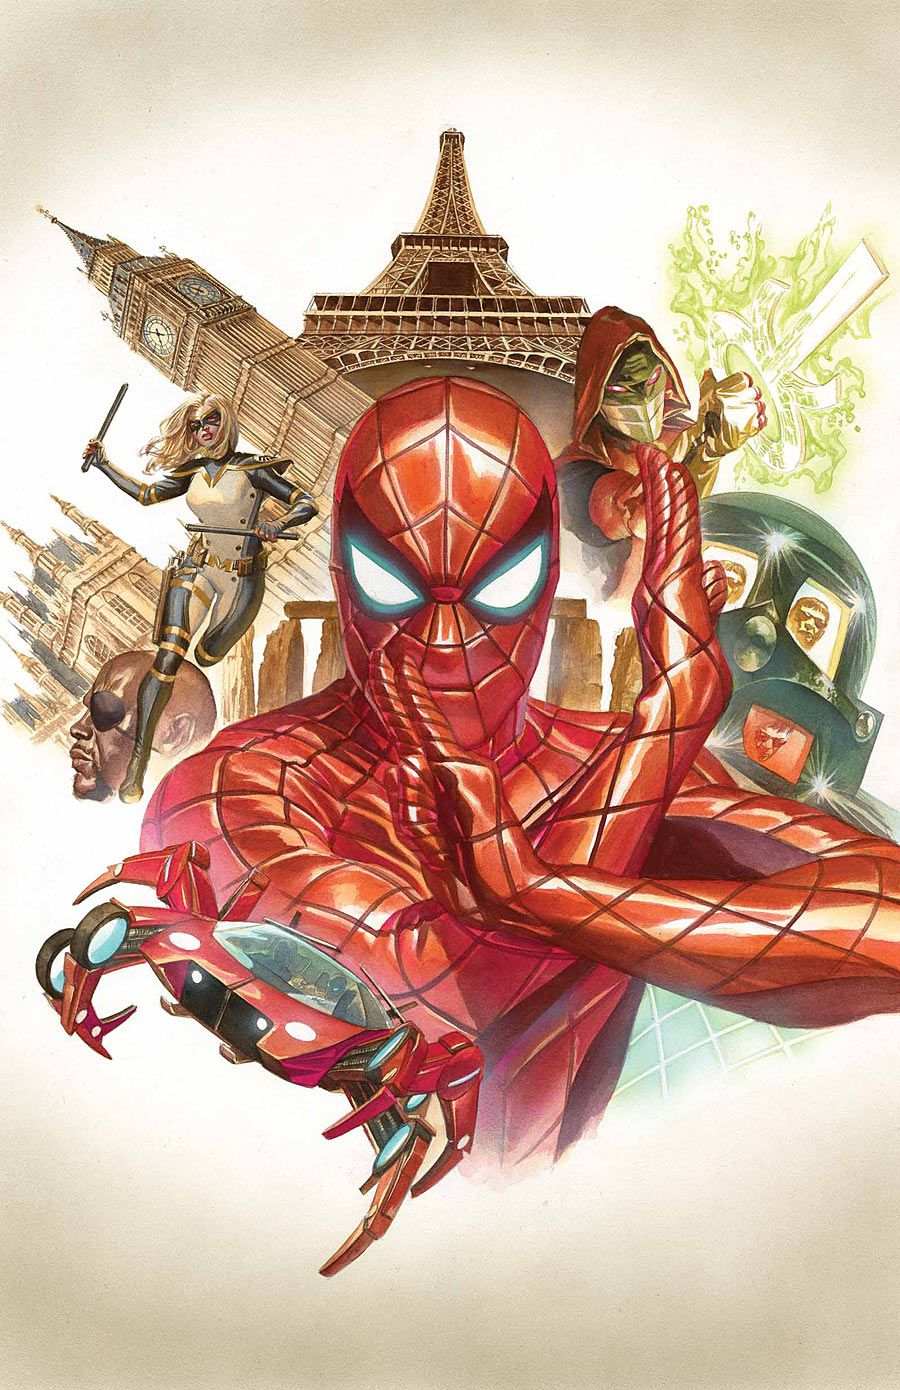 #Amazing #Spiderman #Fan #Art. (Åmazing Spider-Man Vol.4 #9 Cover) By: Alex Ross. (THE * 5 * STÅR * ÅWARD * OF: * AW YEAH, IT'S MAJOR ÅWESOMENESS!!!™)[THANK Ü 4 PINNING!!!<·><]<©>ÅÅÅ+(OB4E)                  https://s-media-cache-ak0.pinimg.com/474x/ad/00/98/ad0098a184aef8af24d7c990b1a28fce.jpg